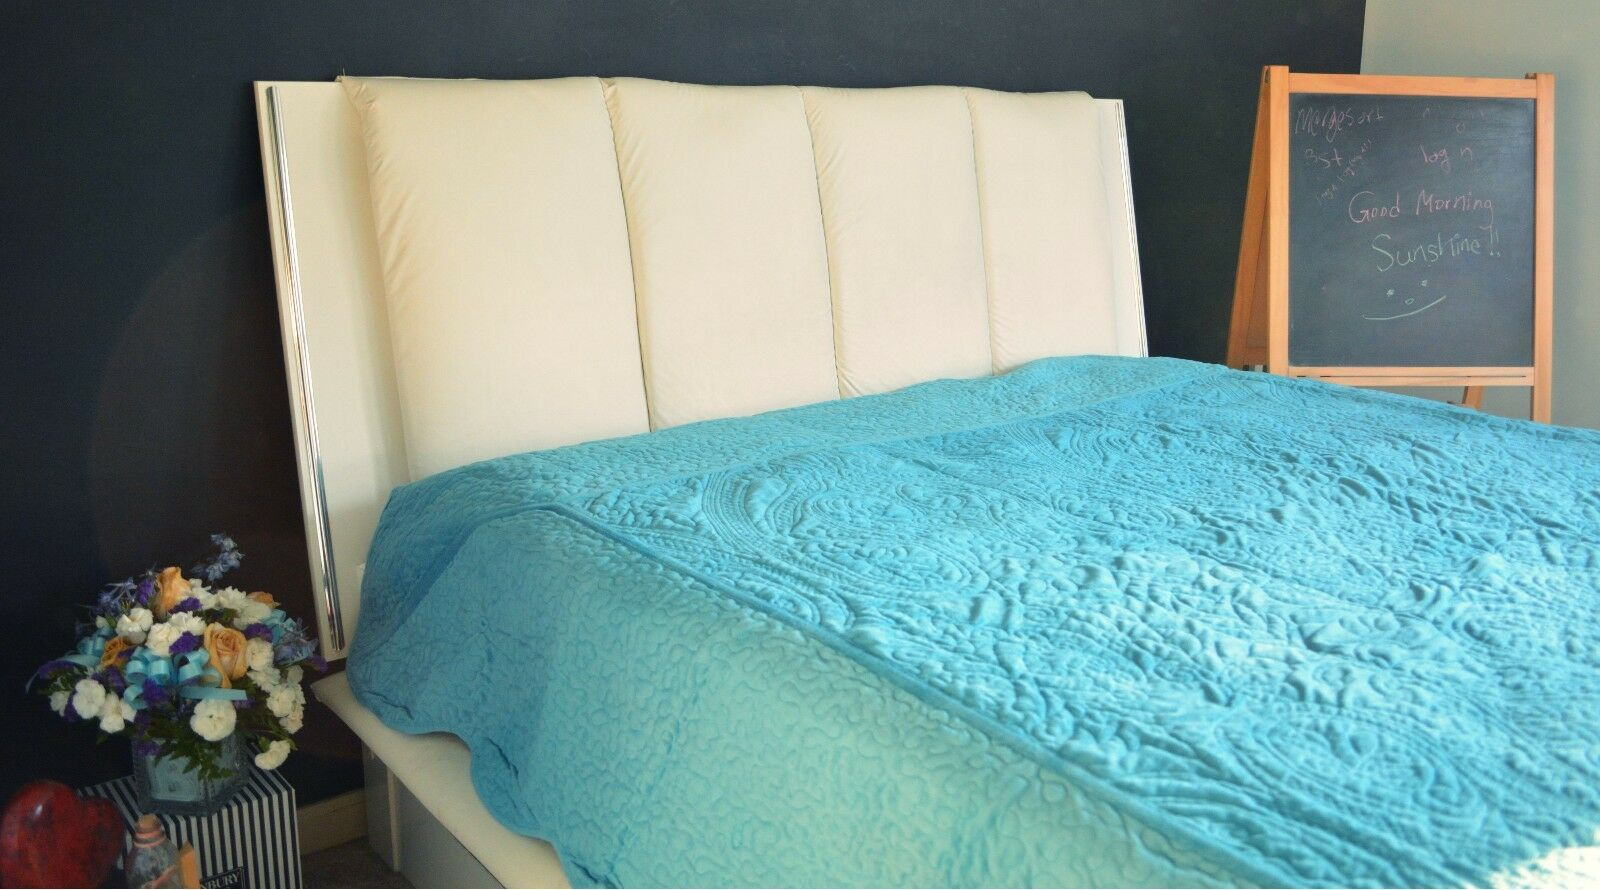 Matelasse 3-5 Piece Solid Plush Super Soft Magic Carpet Quilt Bedspread Set